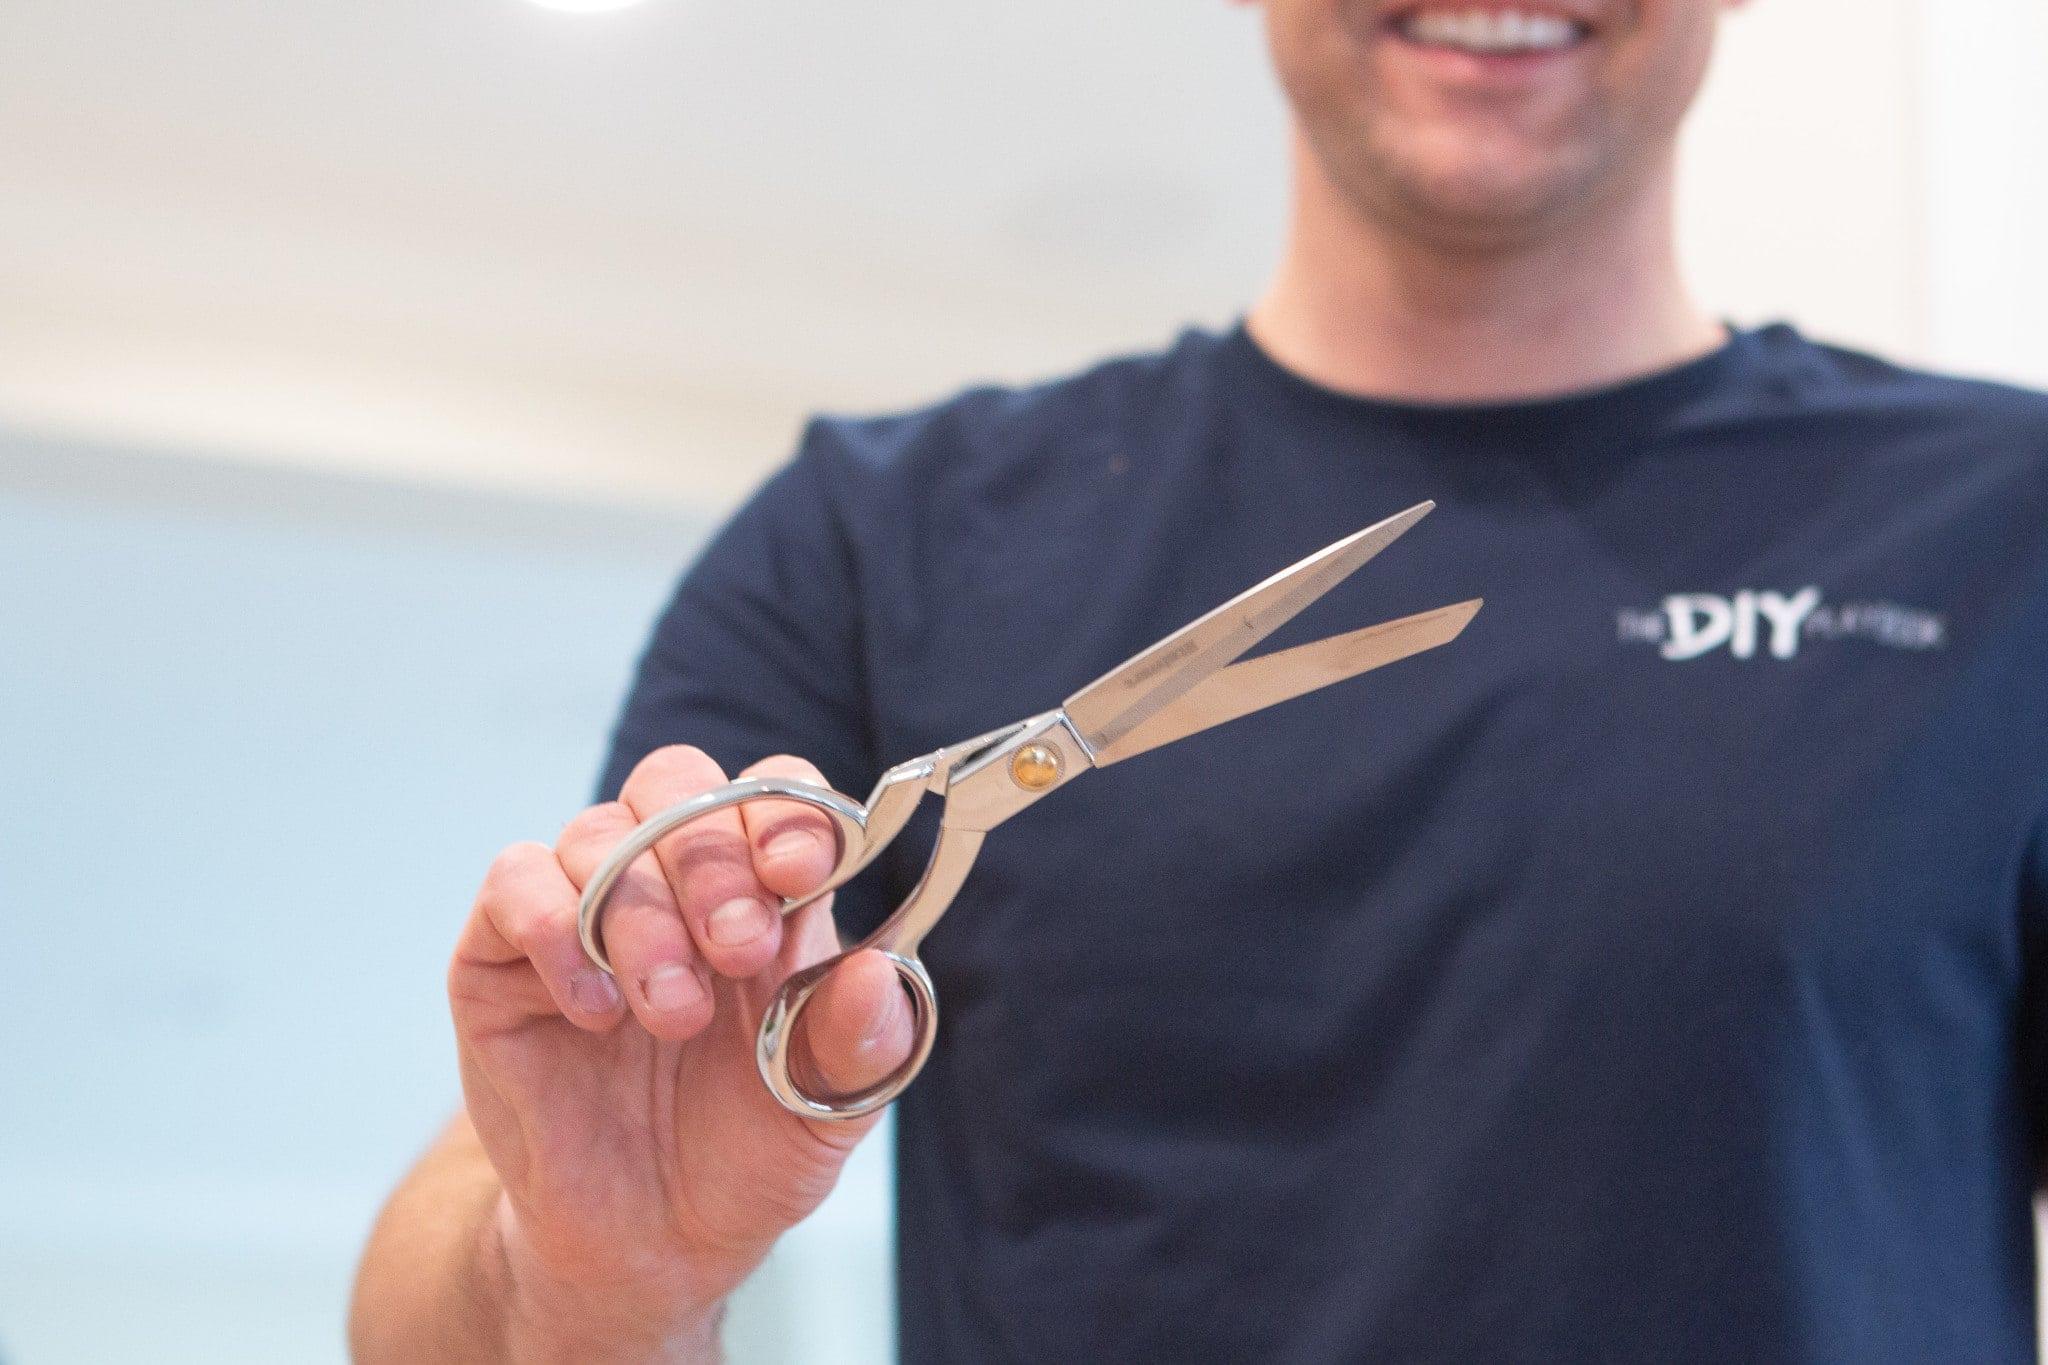 New fabric scissors